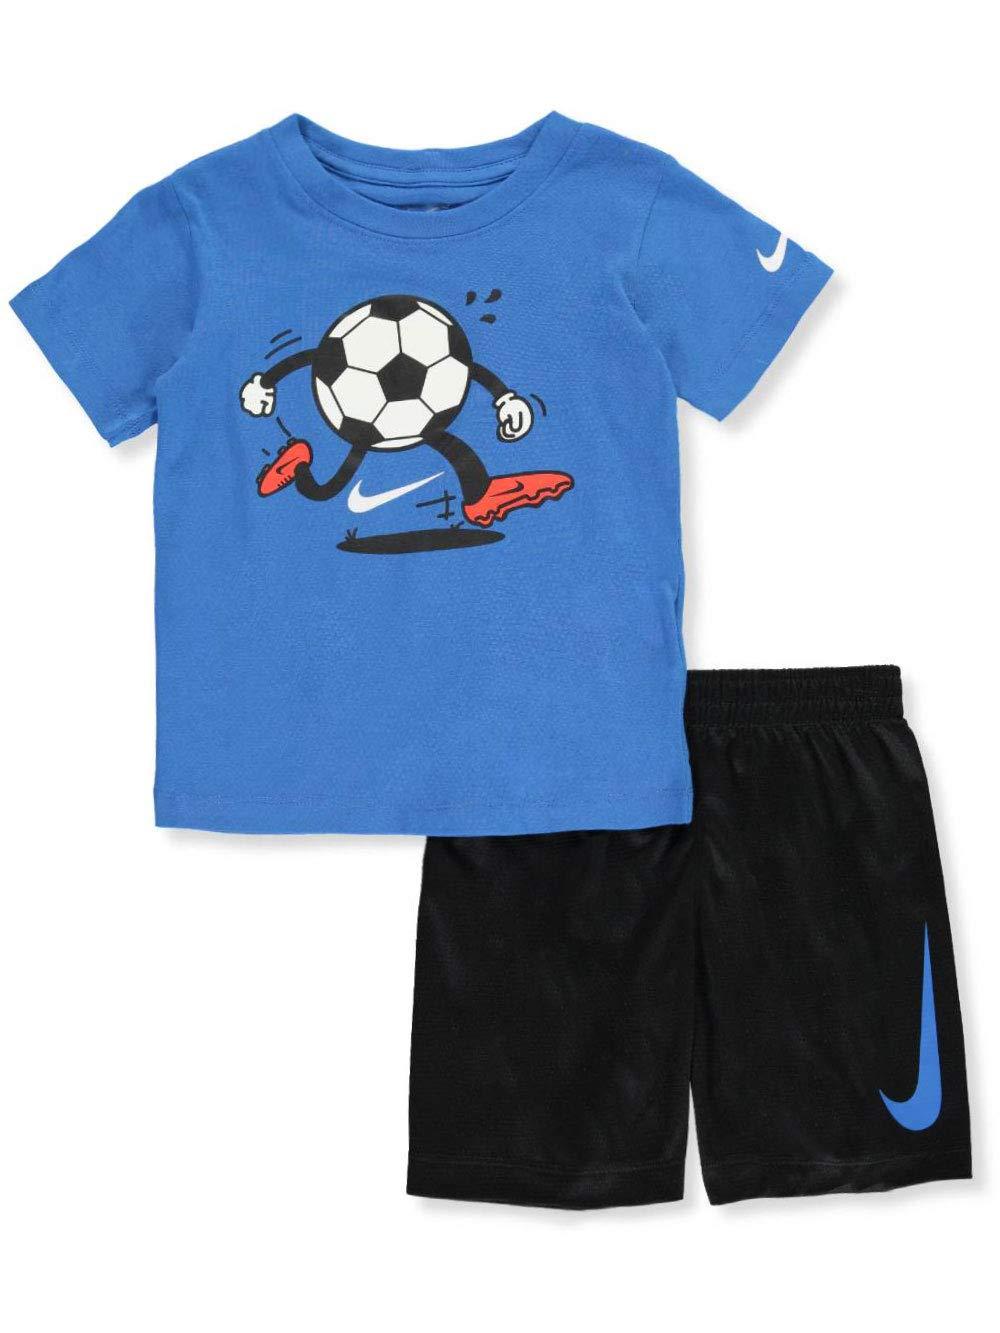 Nike Boys' 2-Piece Shorts Set Outfit - Black, 6